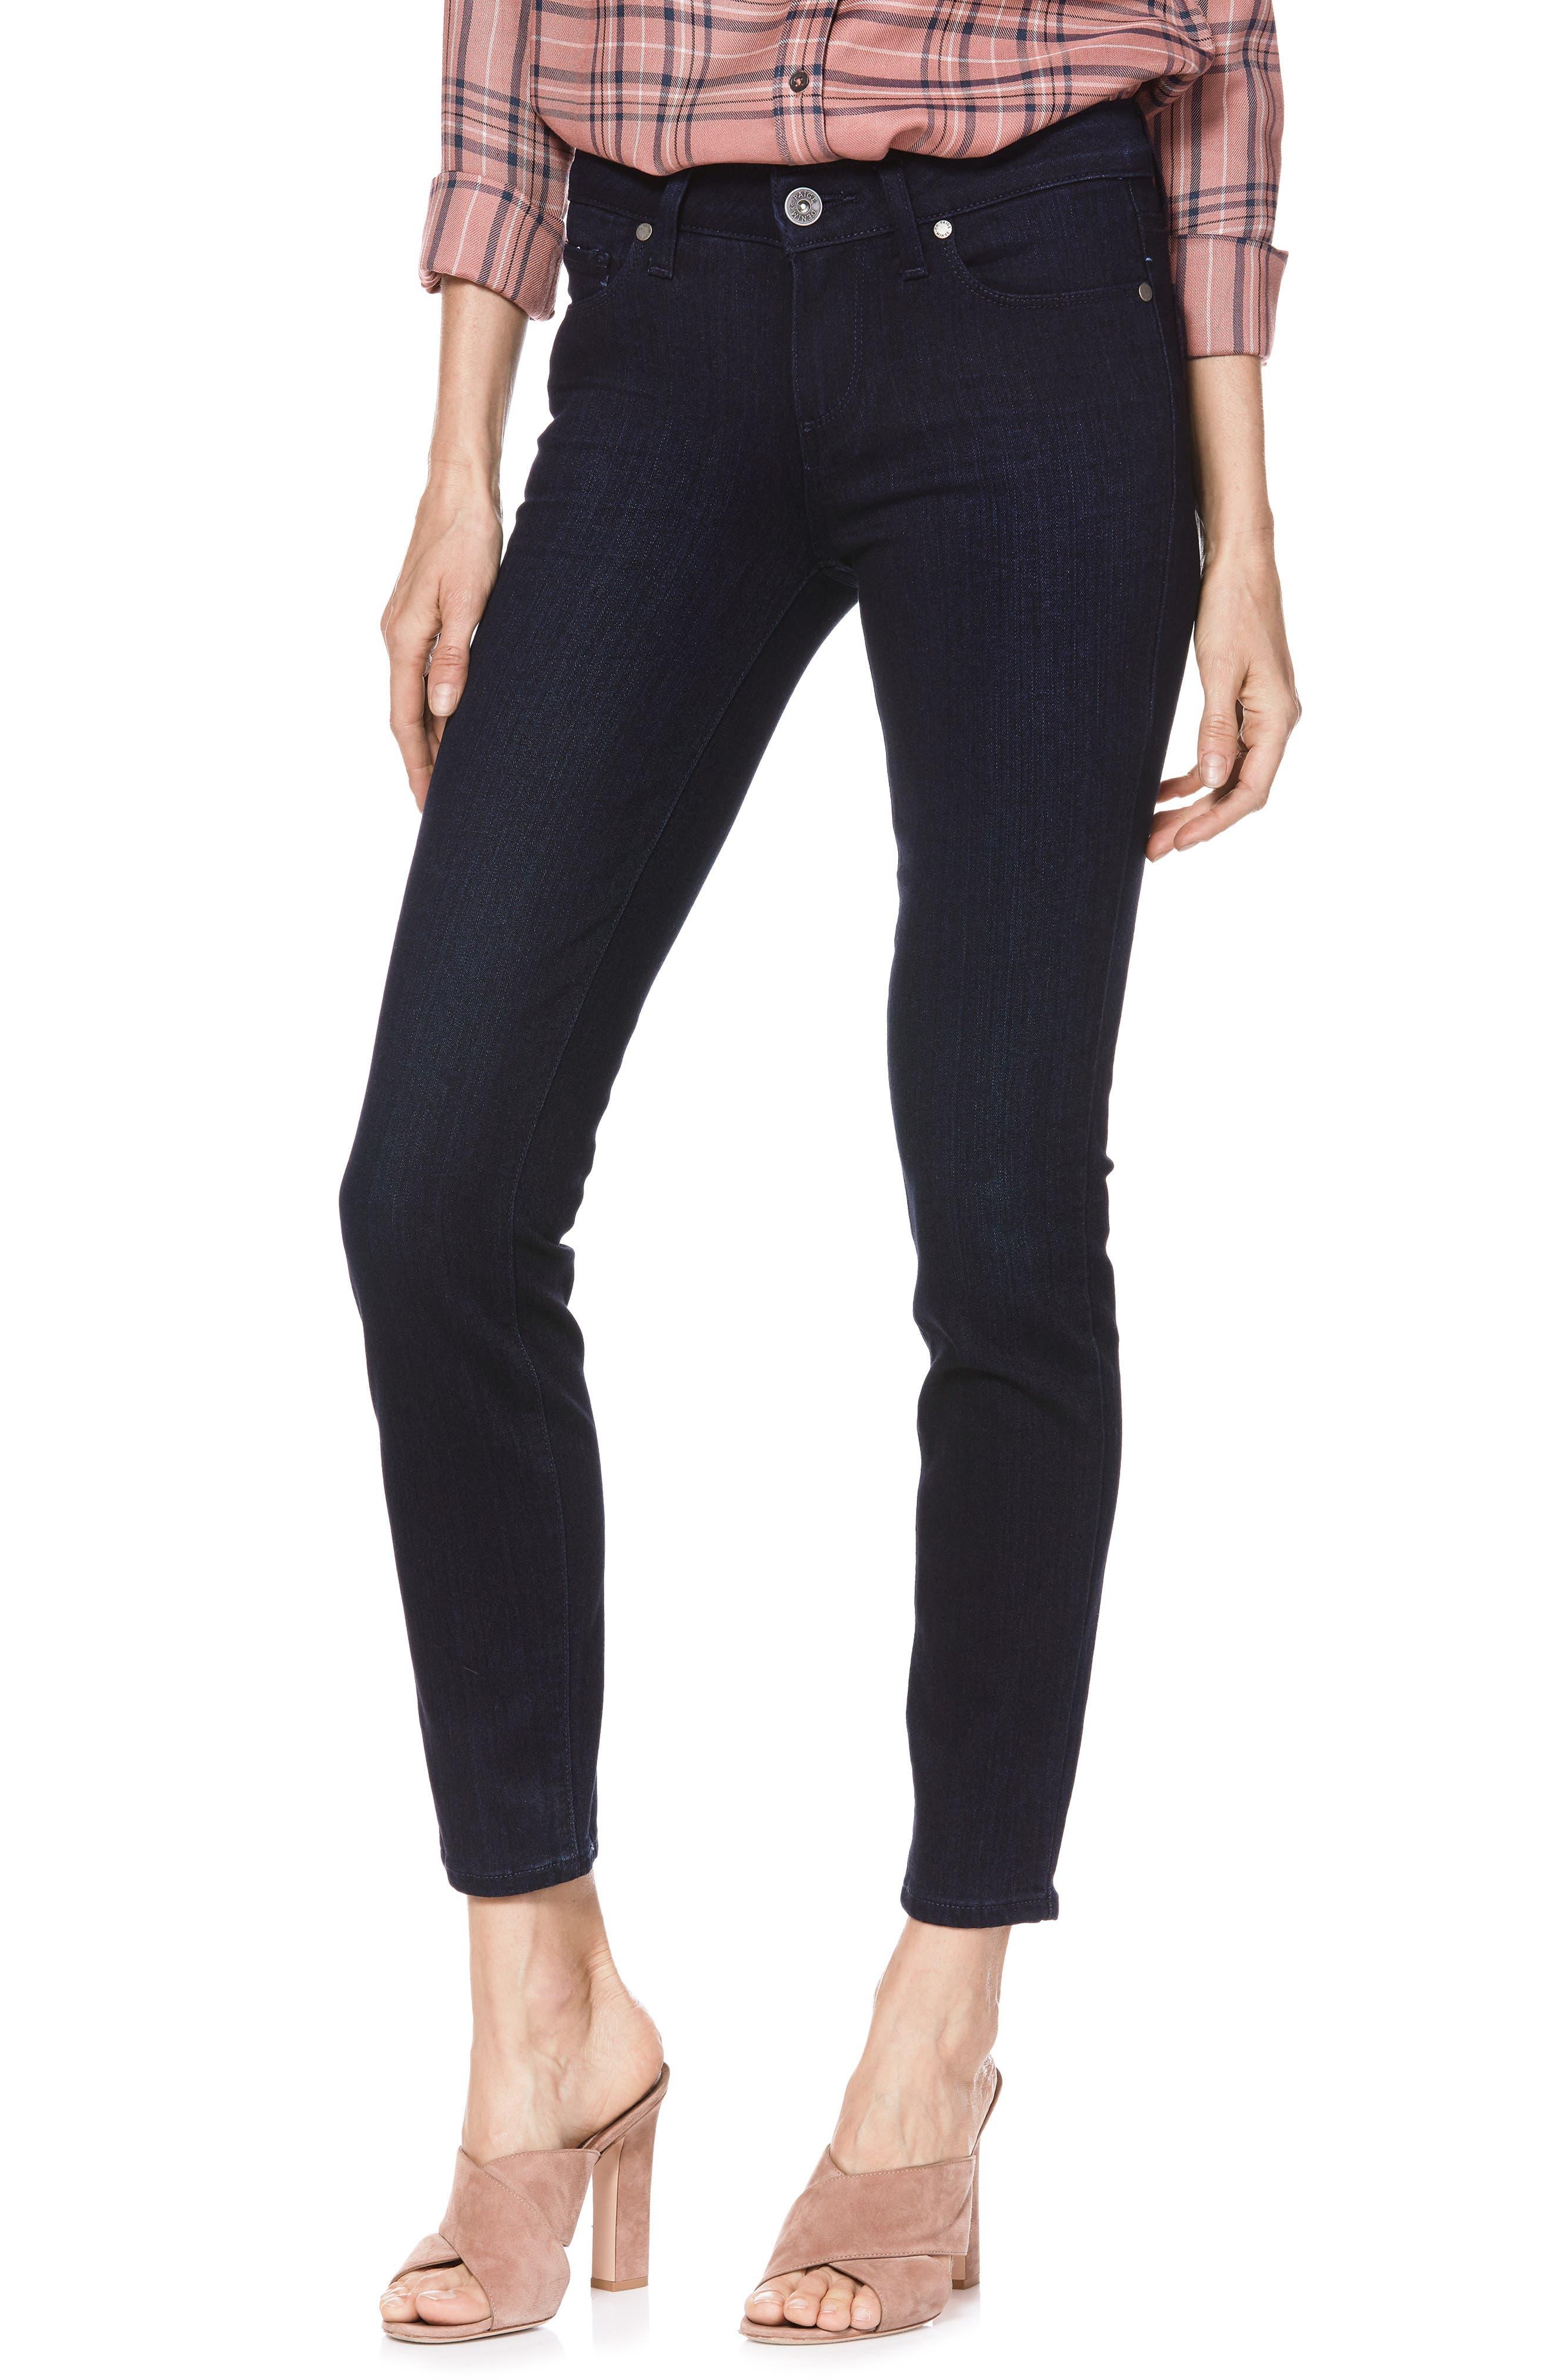 Transcend - Verdugo Ankle Skinny Jeans,                         Main,                         color, LANA